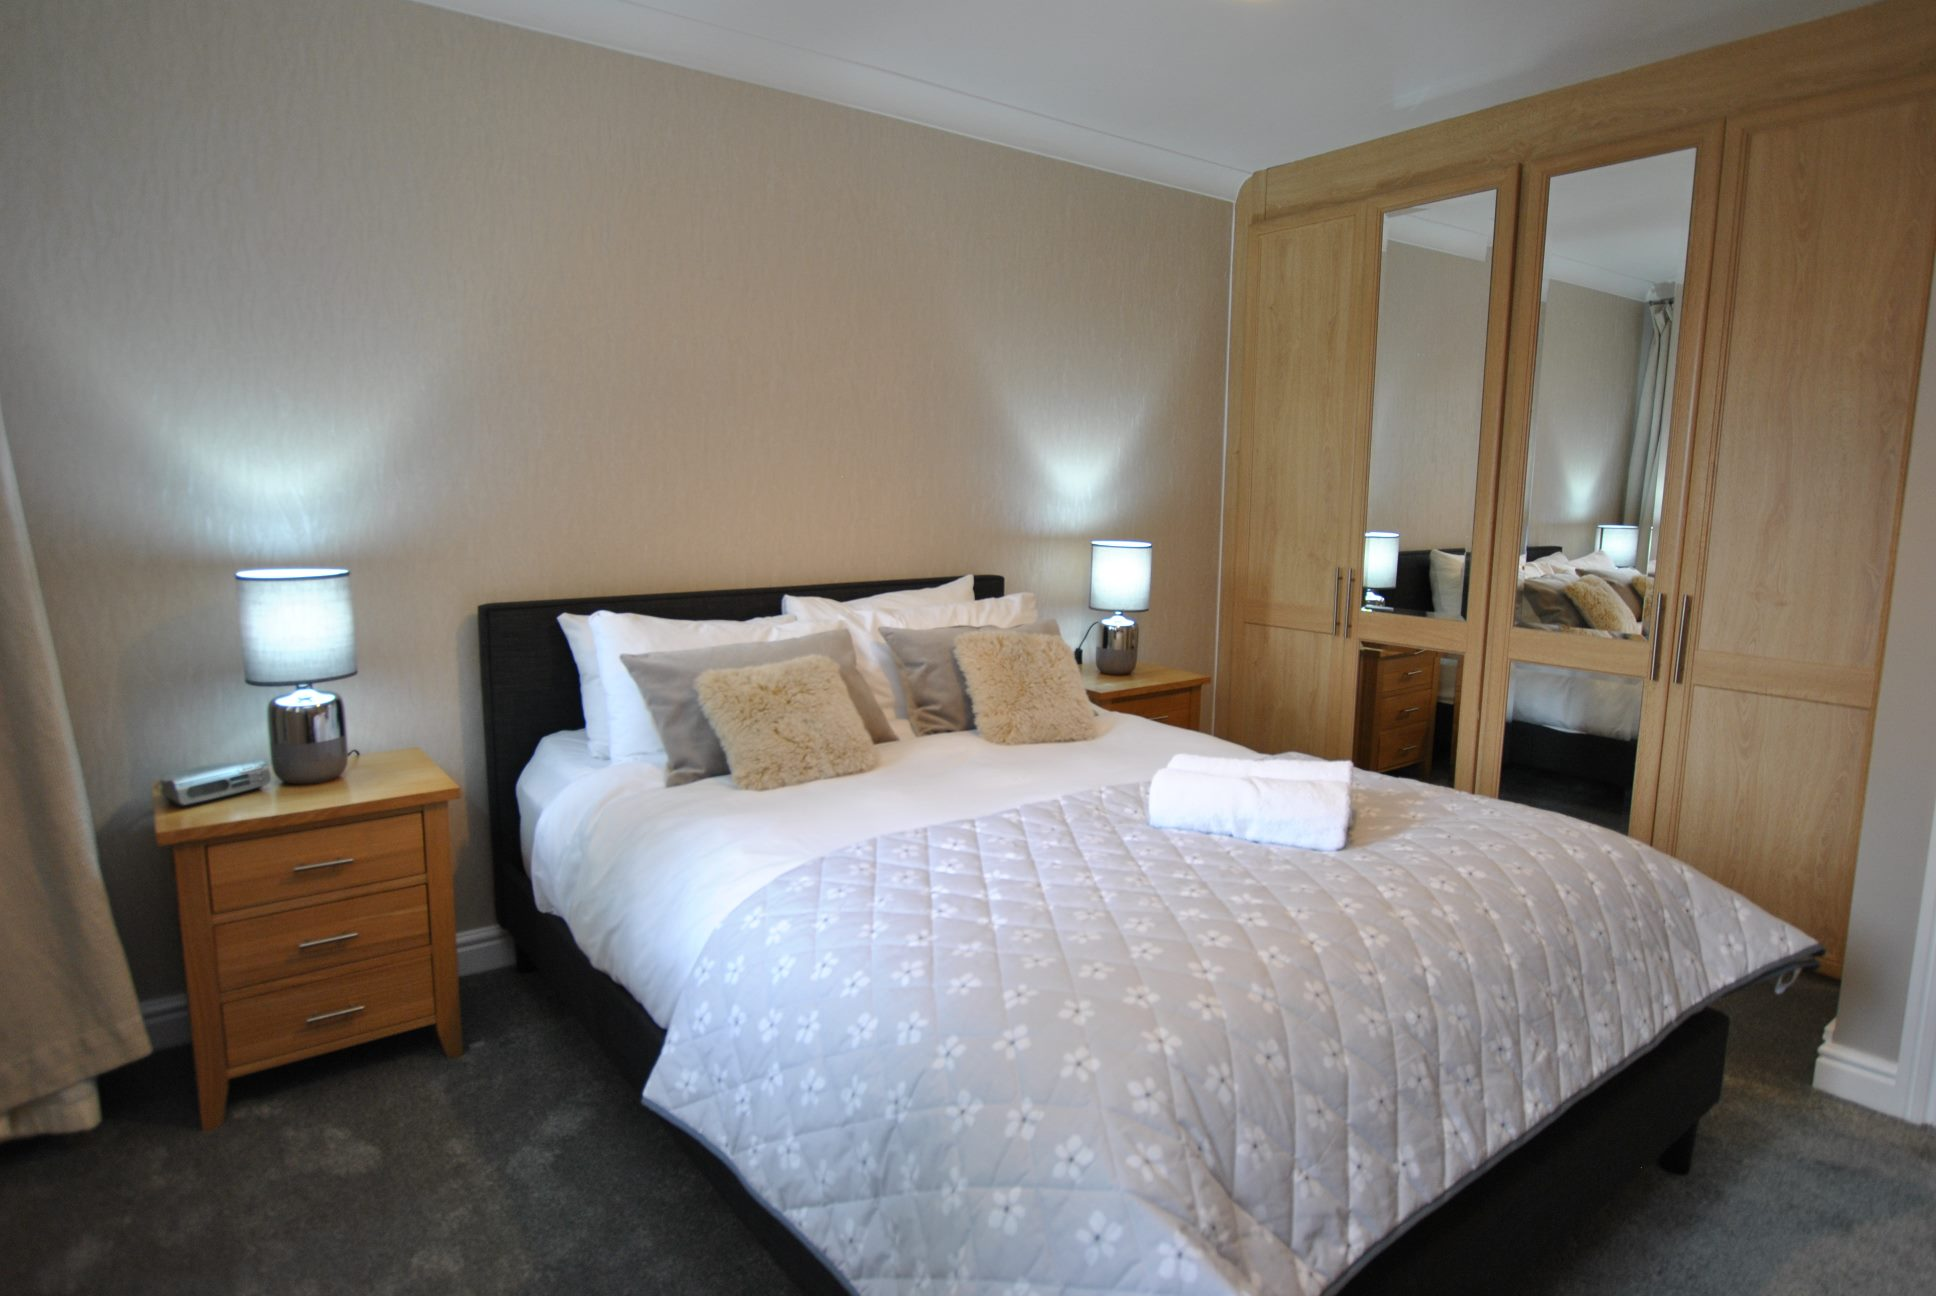 Double bed at Elizabeth Court Apartments